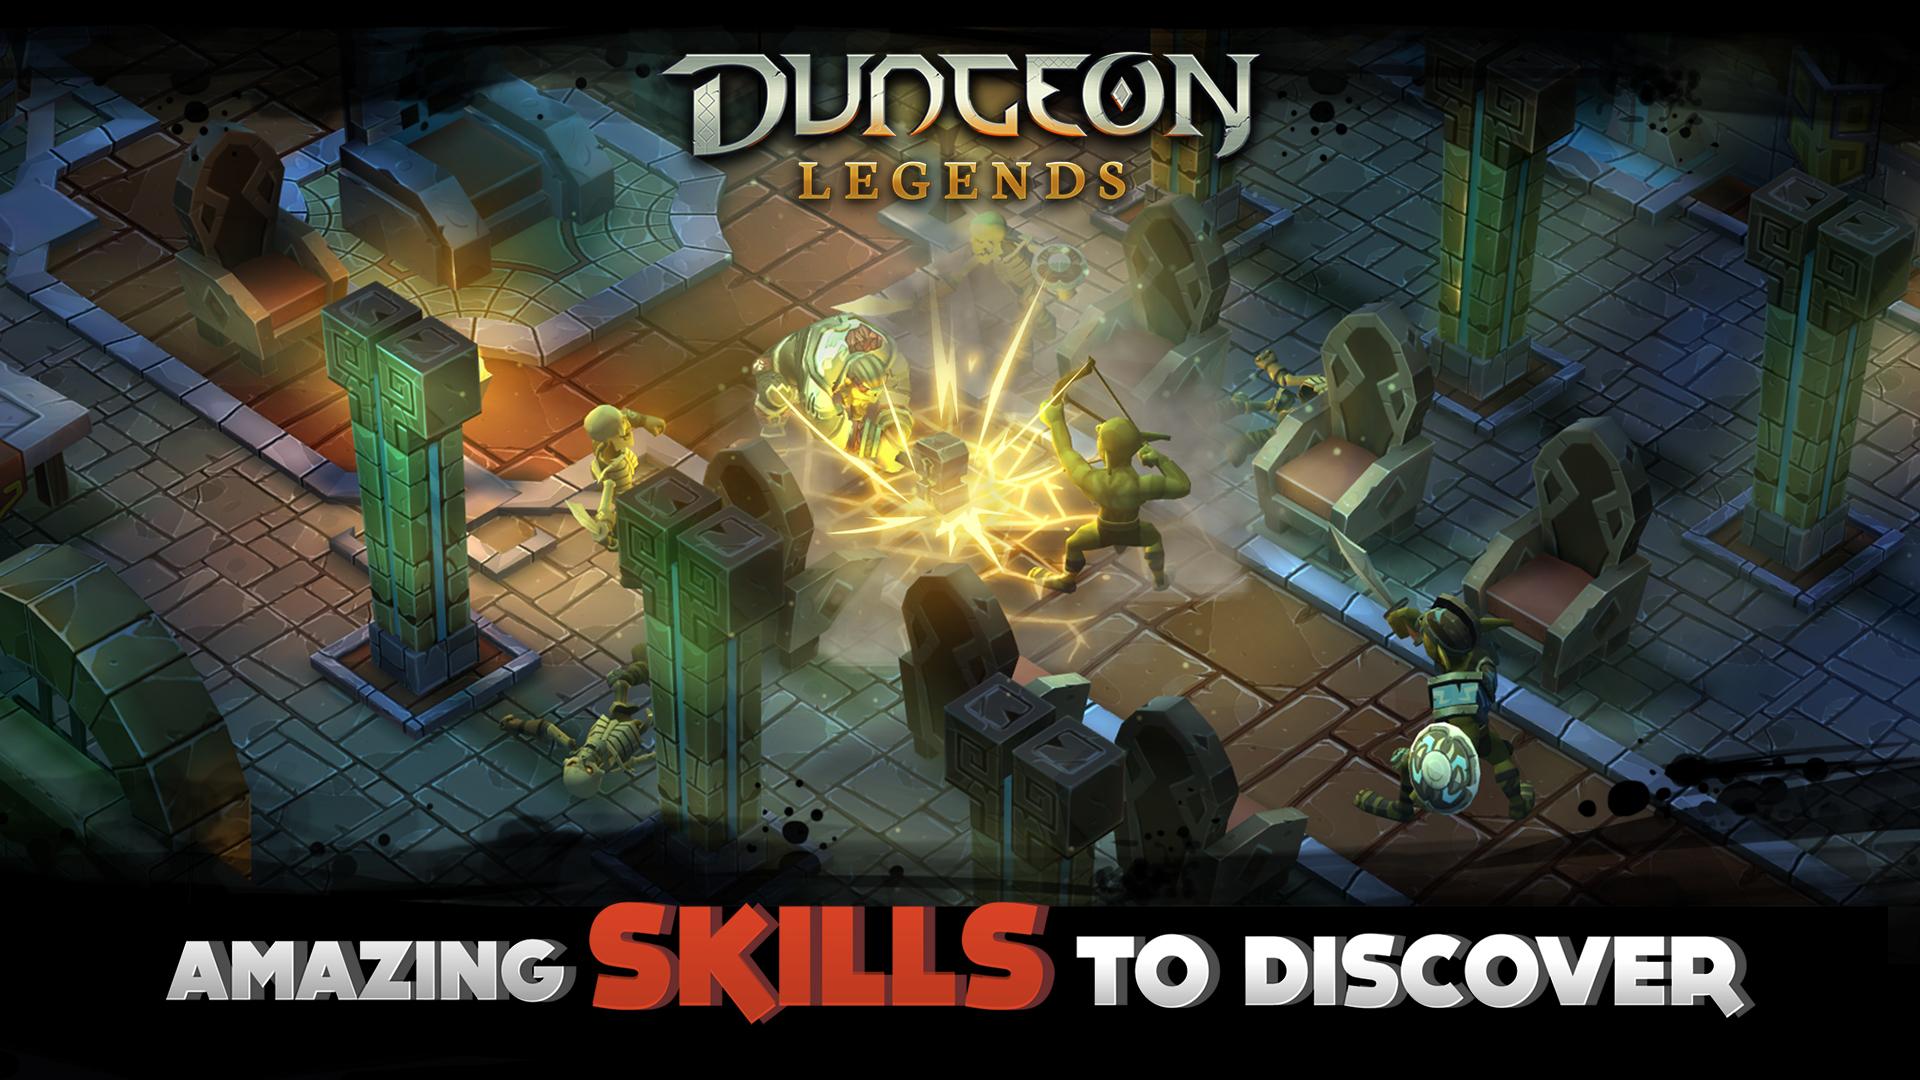 kbp_dungeonlegend_game4